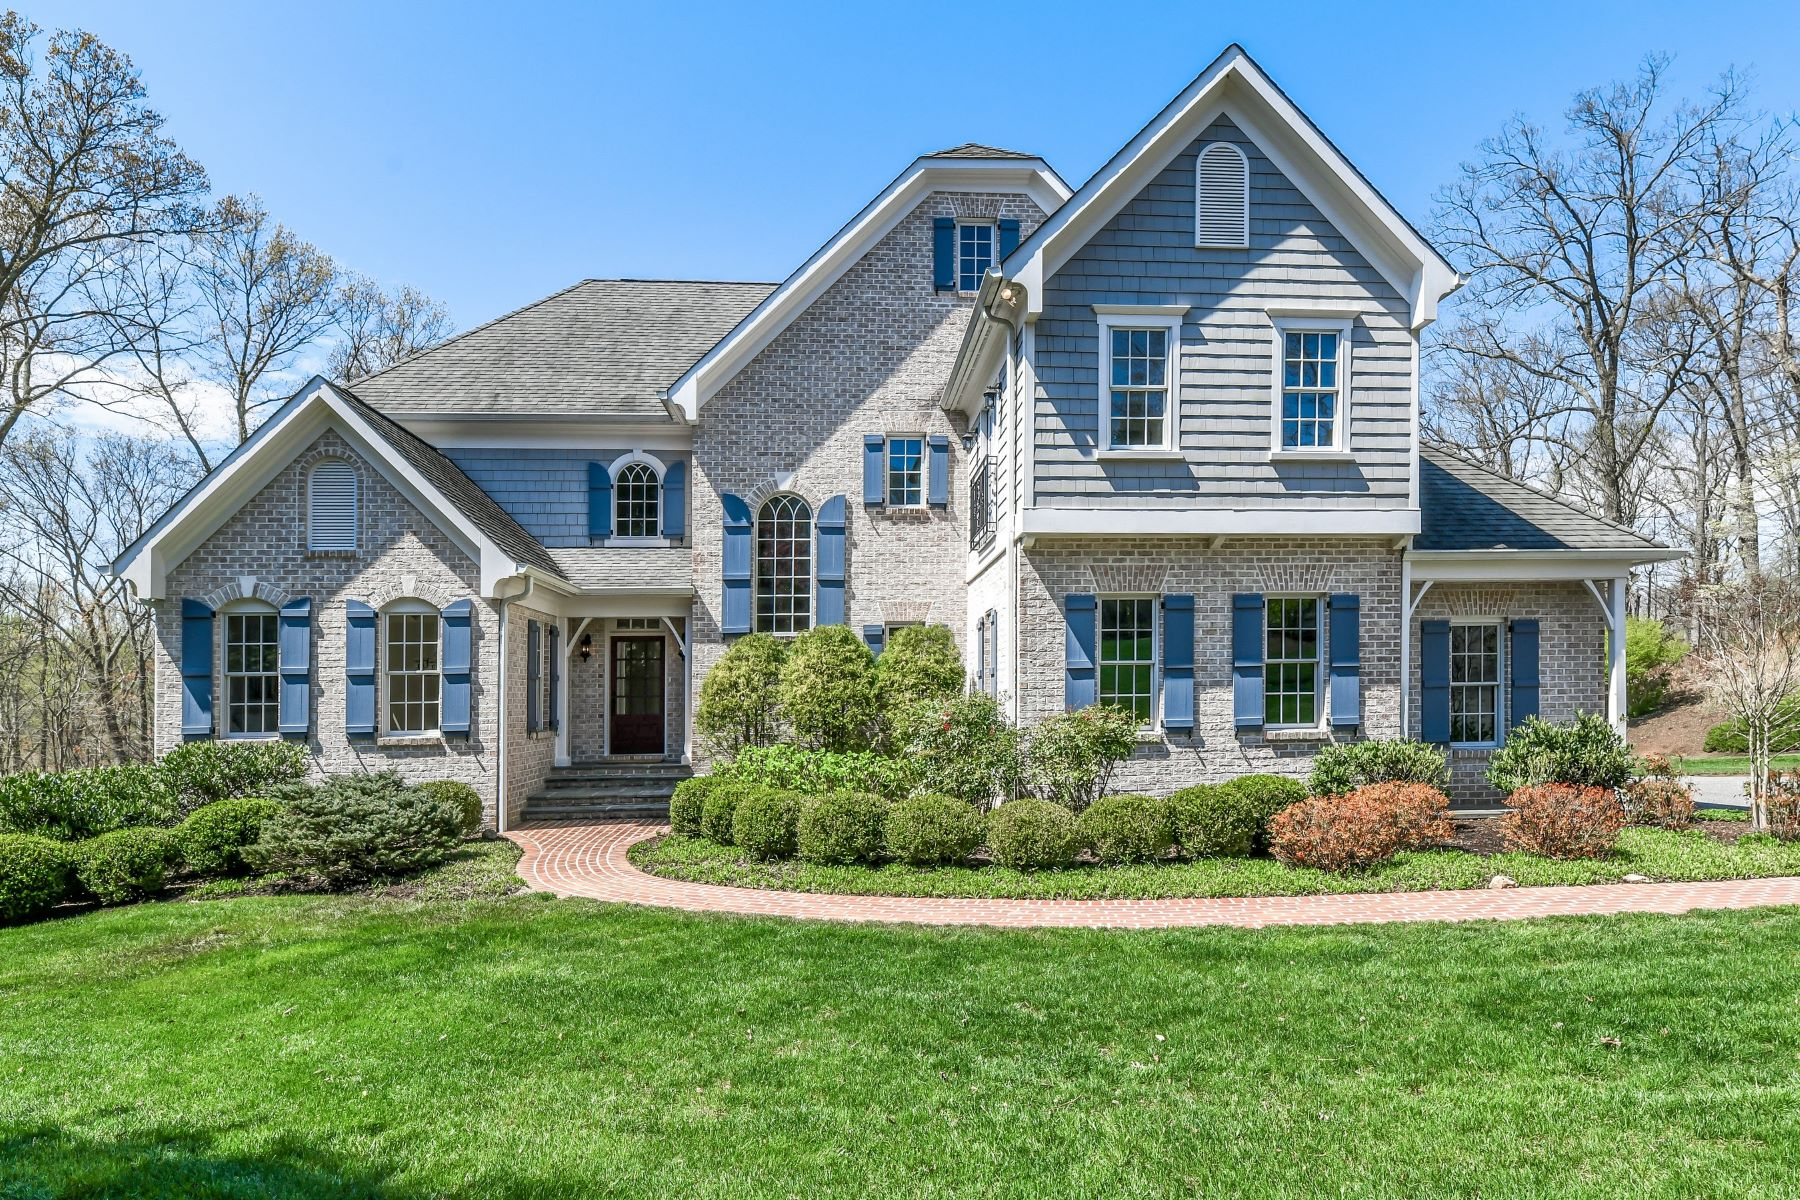 Single Family Homes για την Πώληση στο Ivy Reach Craftsman 23 Ivy Reach Court, Cockeysville, Μεριλαντ 21030 Ηνωμένες Πολιτείες